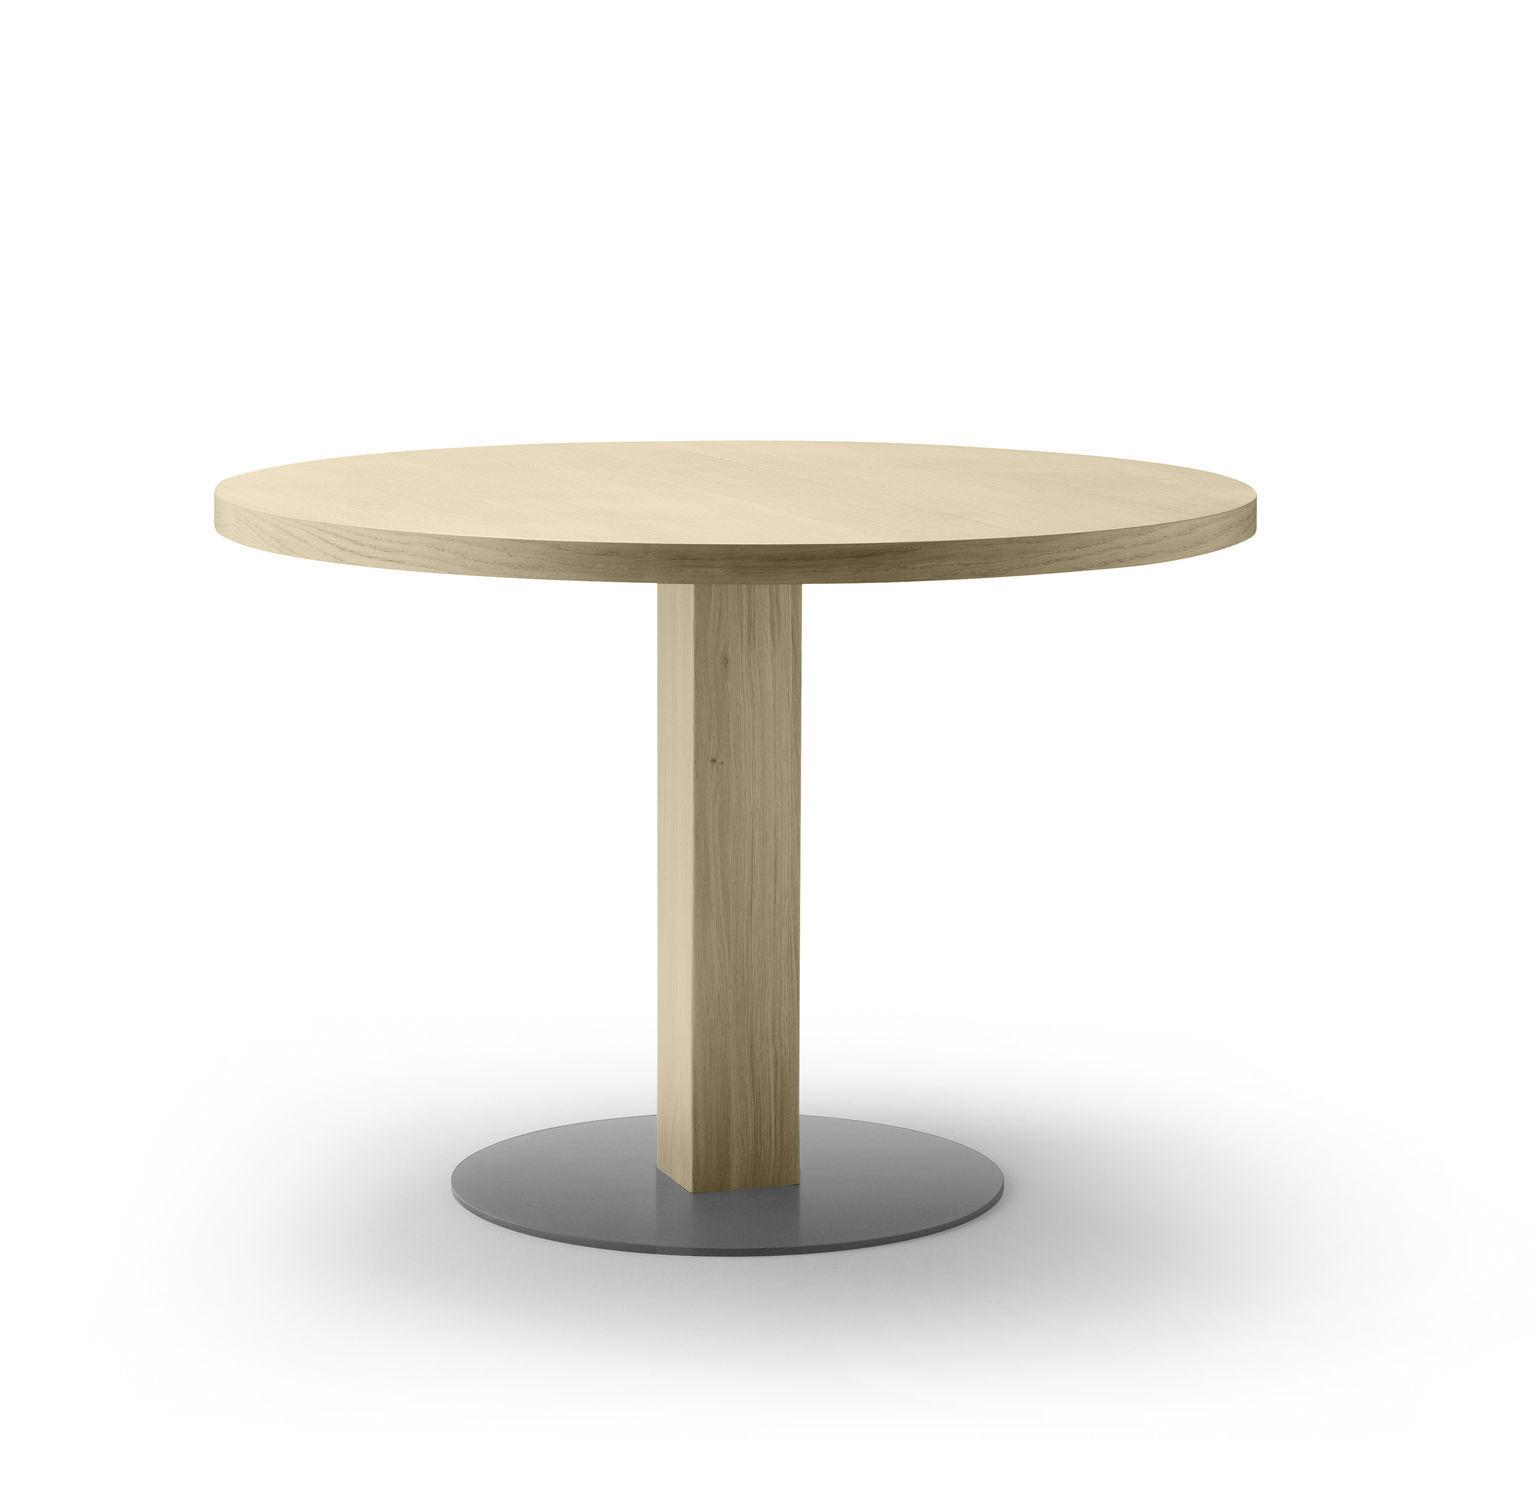 contemporary bistro table  metal  oak  round  emea by jean  -  contemporary bistro table  metal  oak  round emea by jeanlouisiratzoki alki